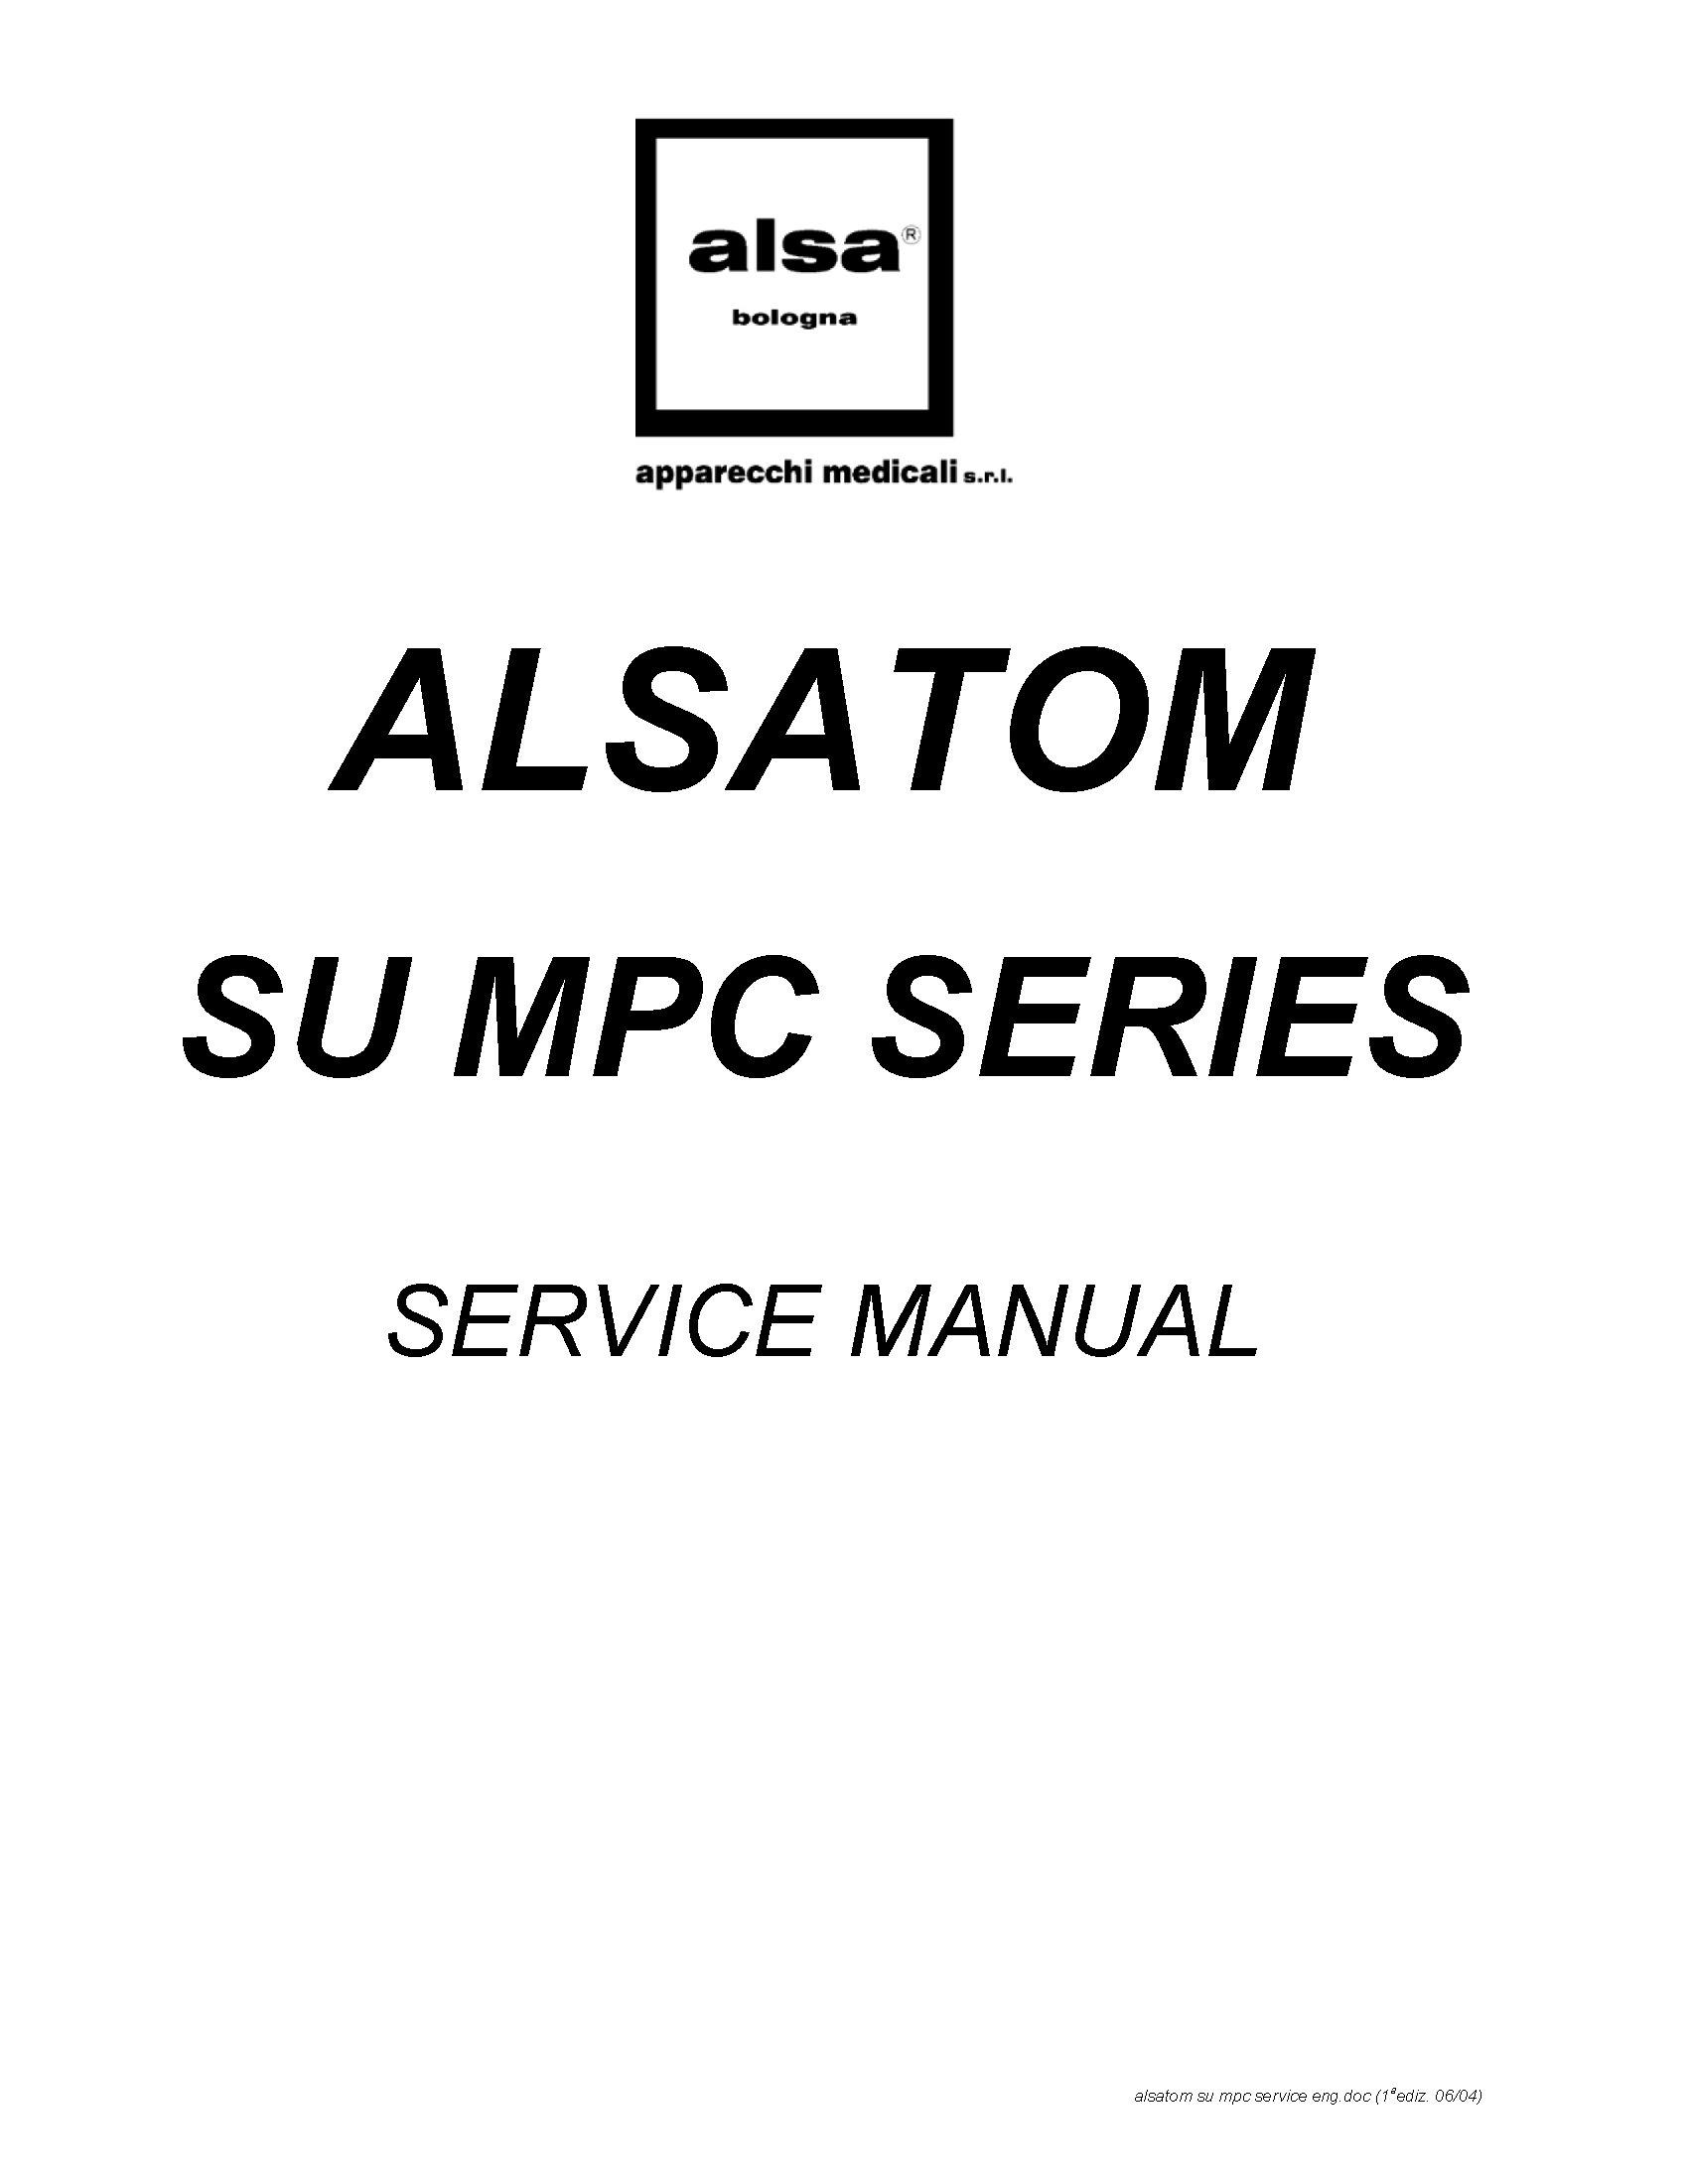 Alsa Alsatom SU, MPC Service manual